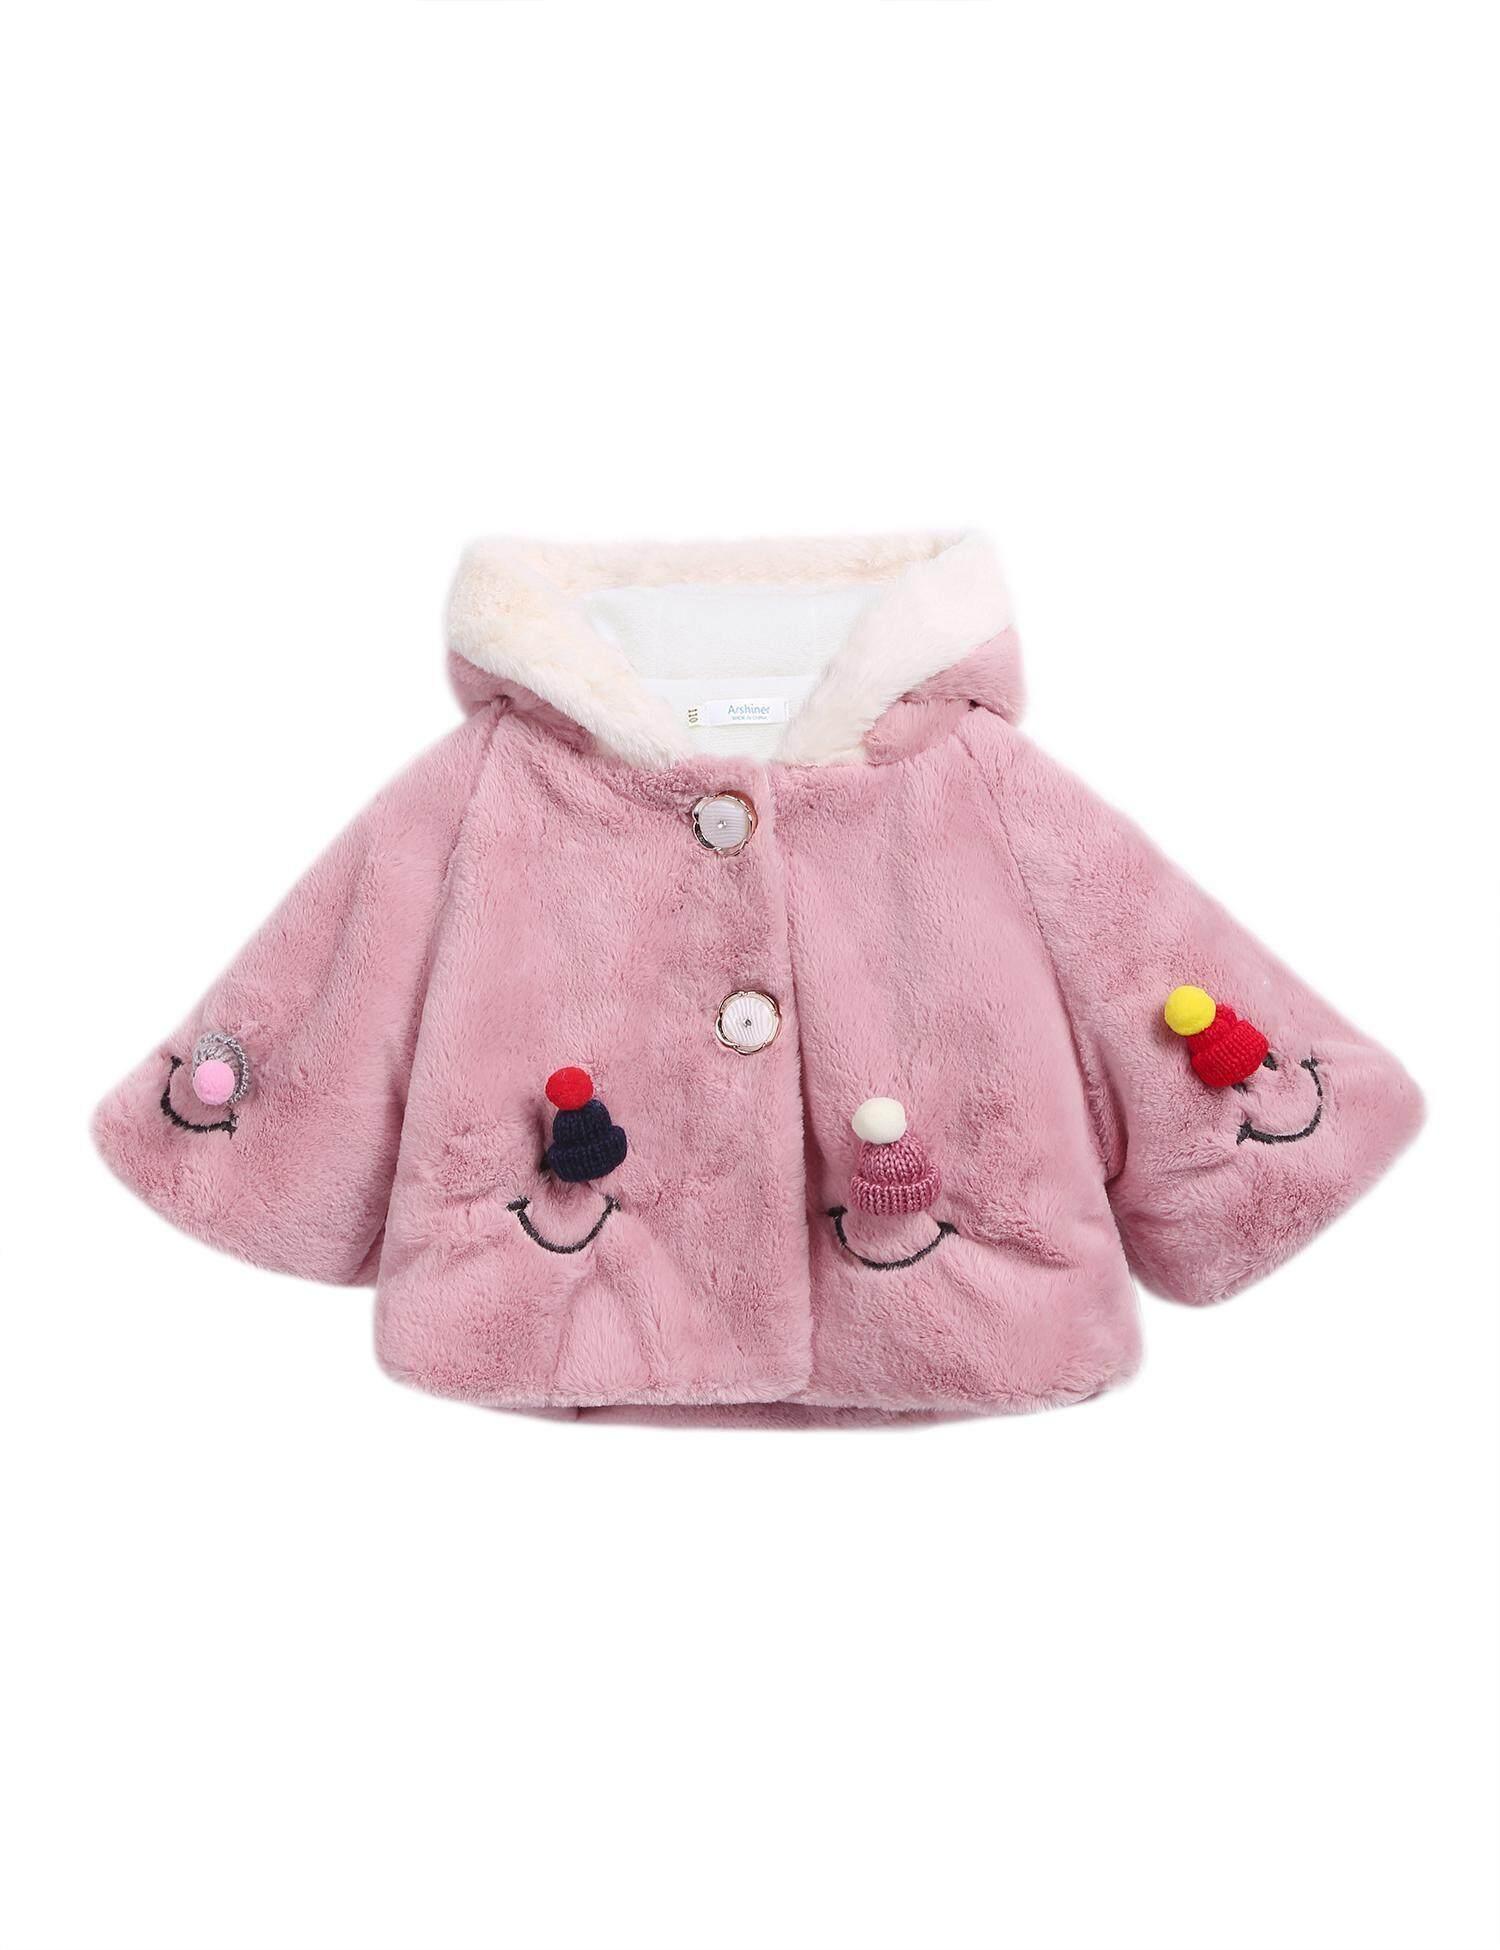 [Dijual Di Rincian Harga] Cyber Diskon Besar Kecil Anak Perempuan Lebih Tahan Dr Penghangat Tebal Musim Dingin Berkerudung Bordir Faux Mantel Bulu Jaket (Ungu) -Intl